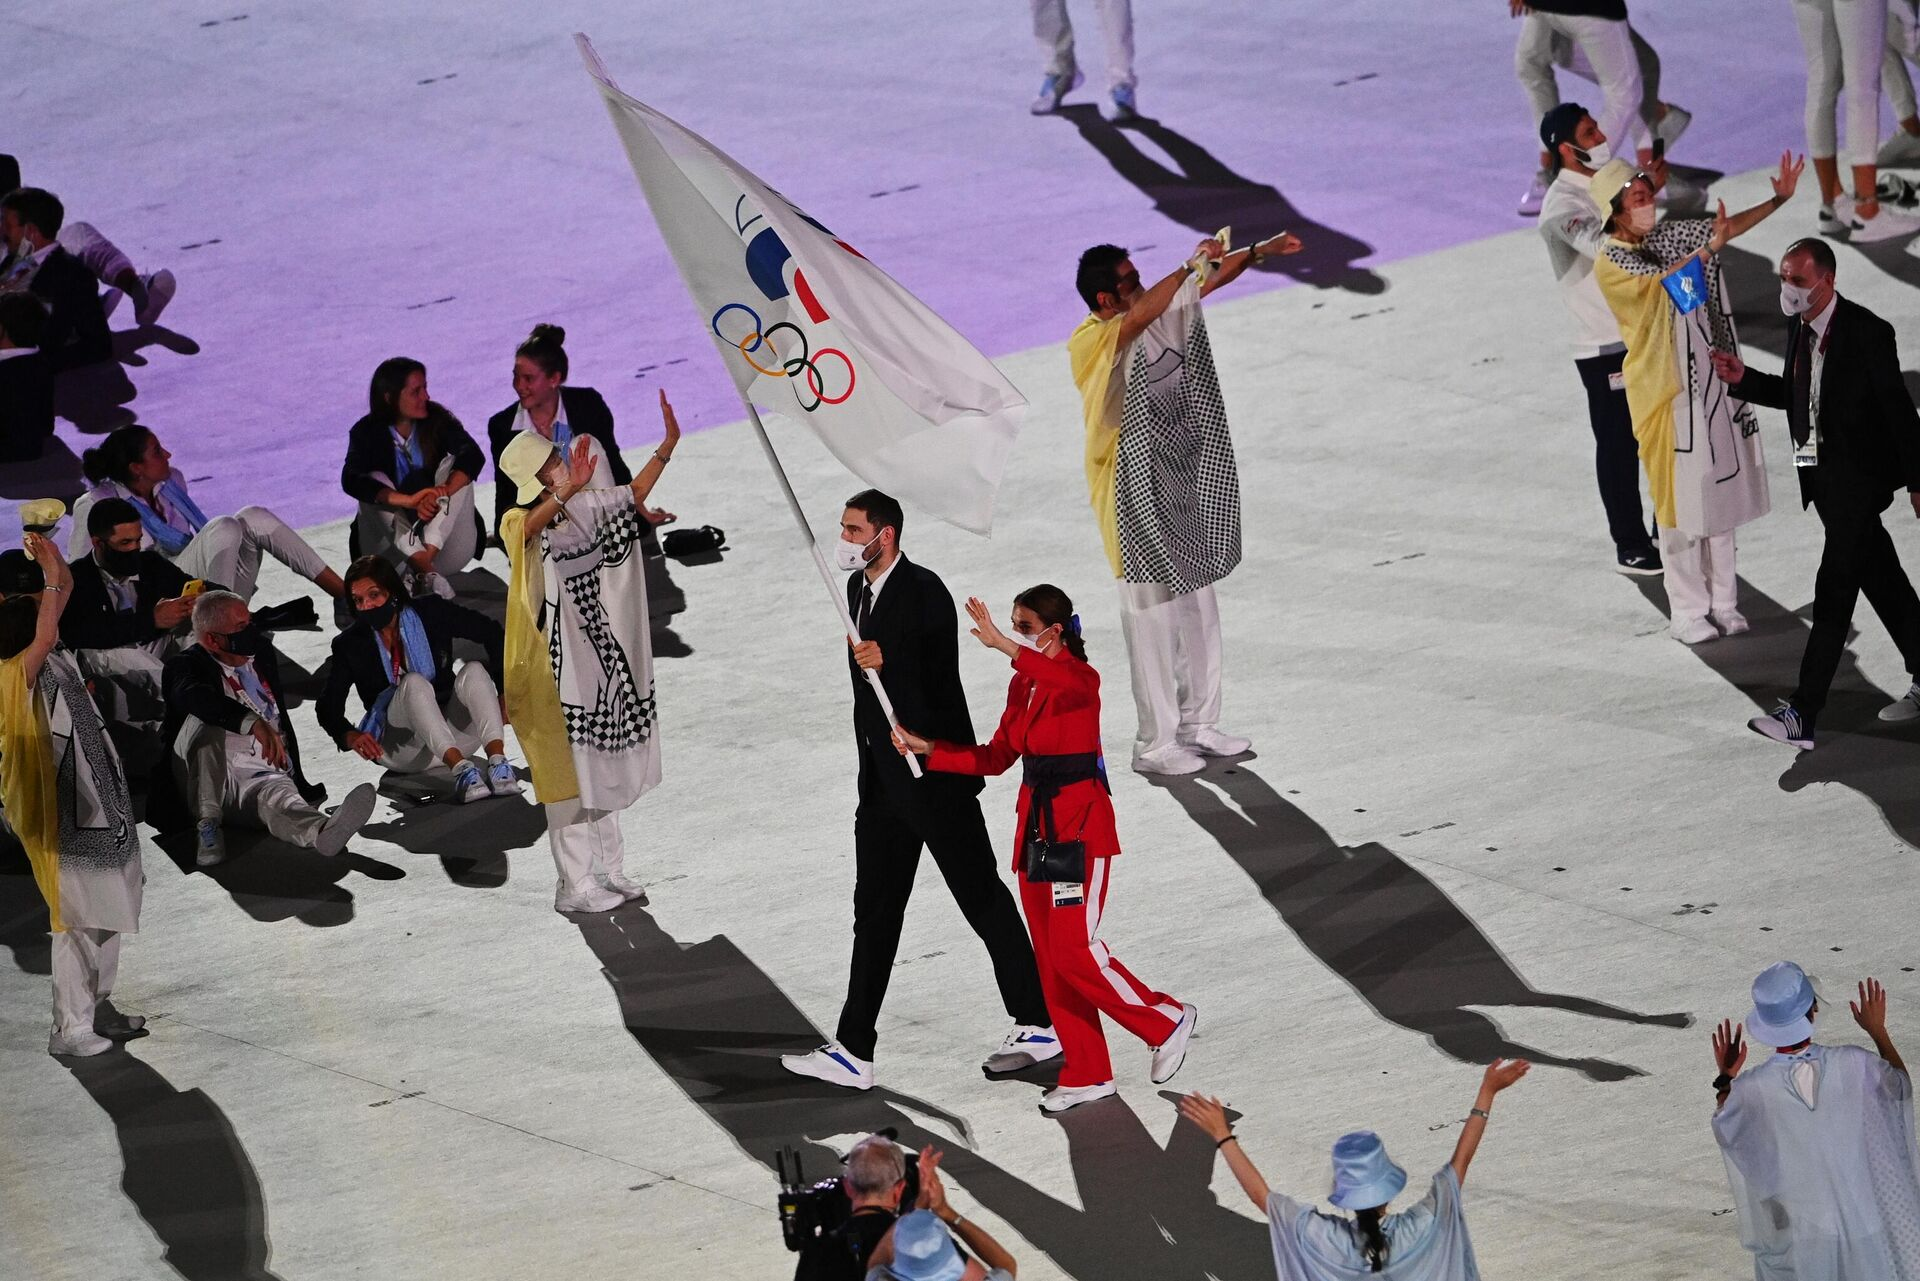 Церемония открытия XXXII летних Олимпийских игр - Sputnik Беларусь, 1920, 23.07.2021